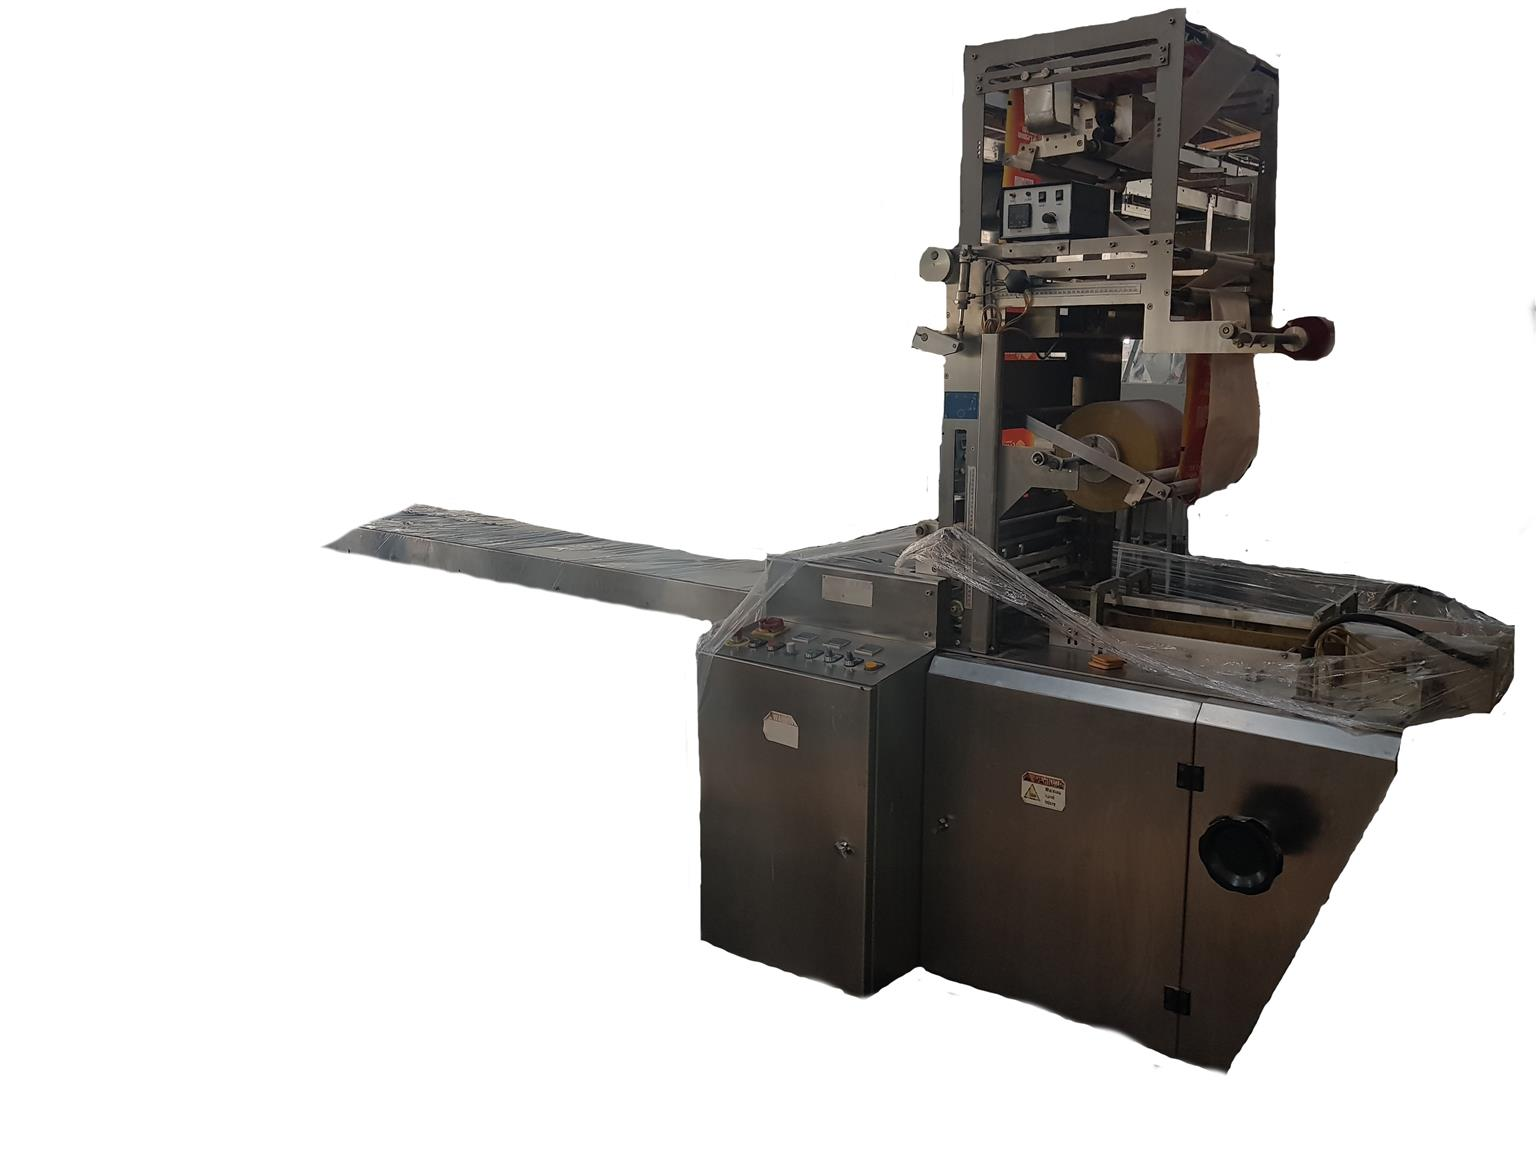 ENVELOPE PACKAGING MACHINE - LEMON CREAMS